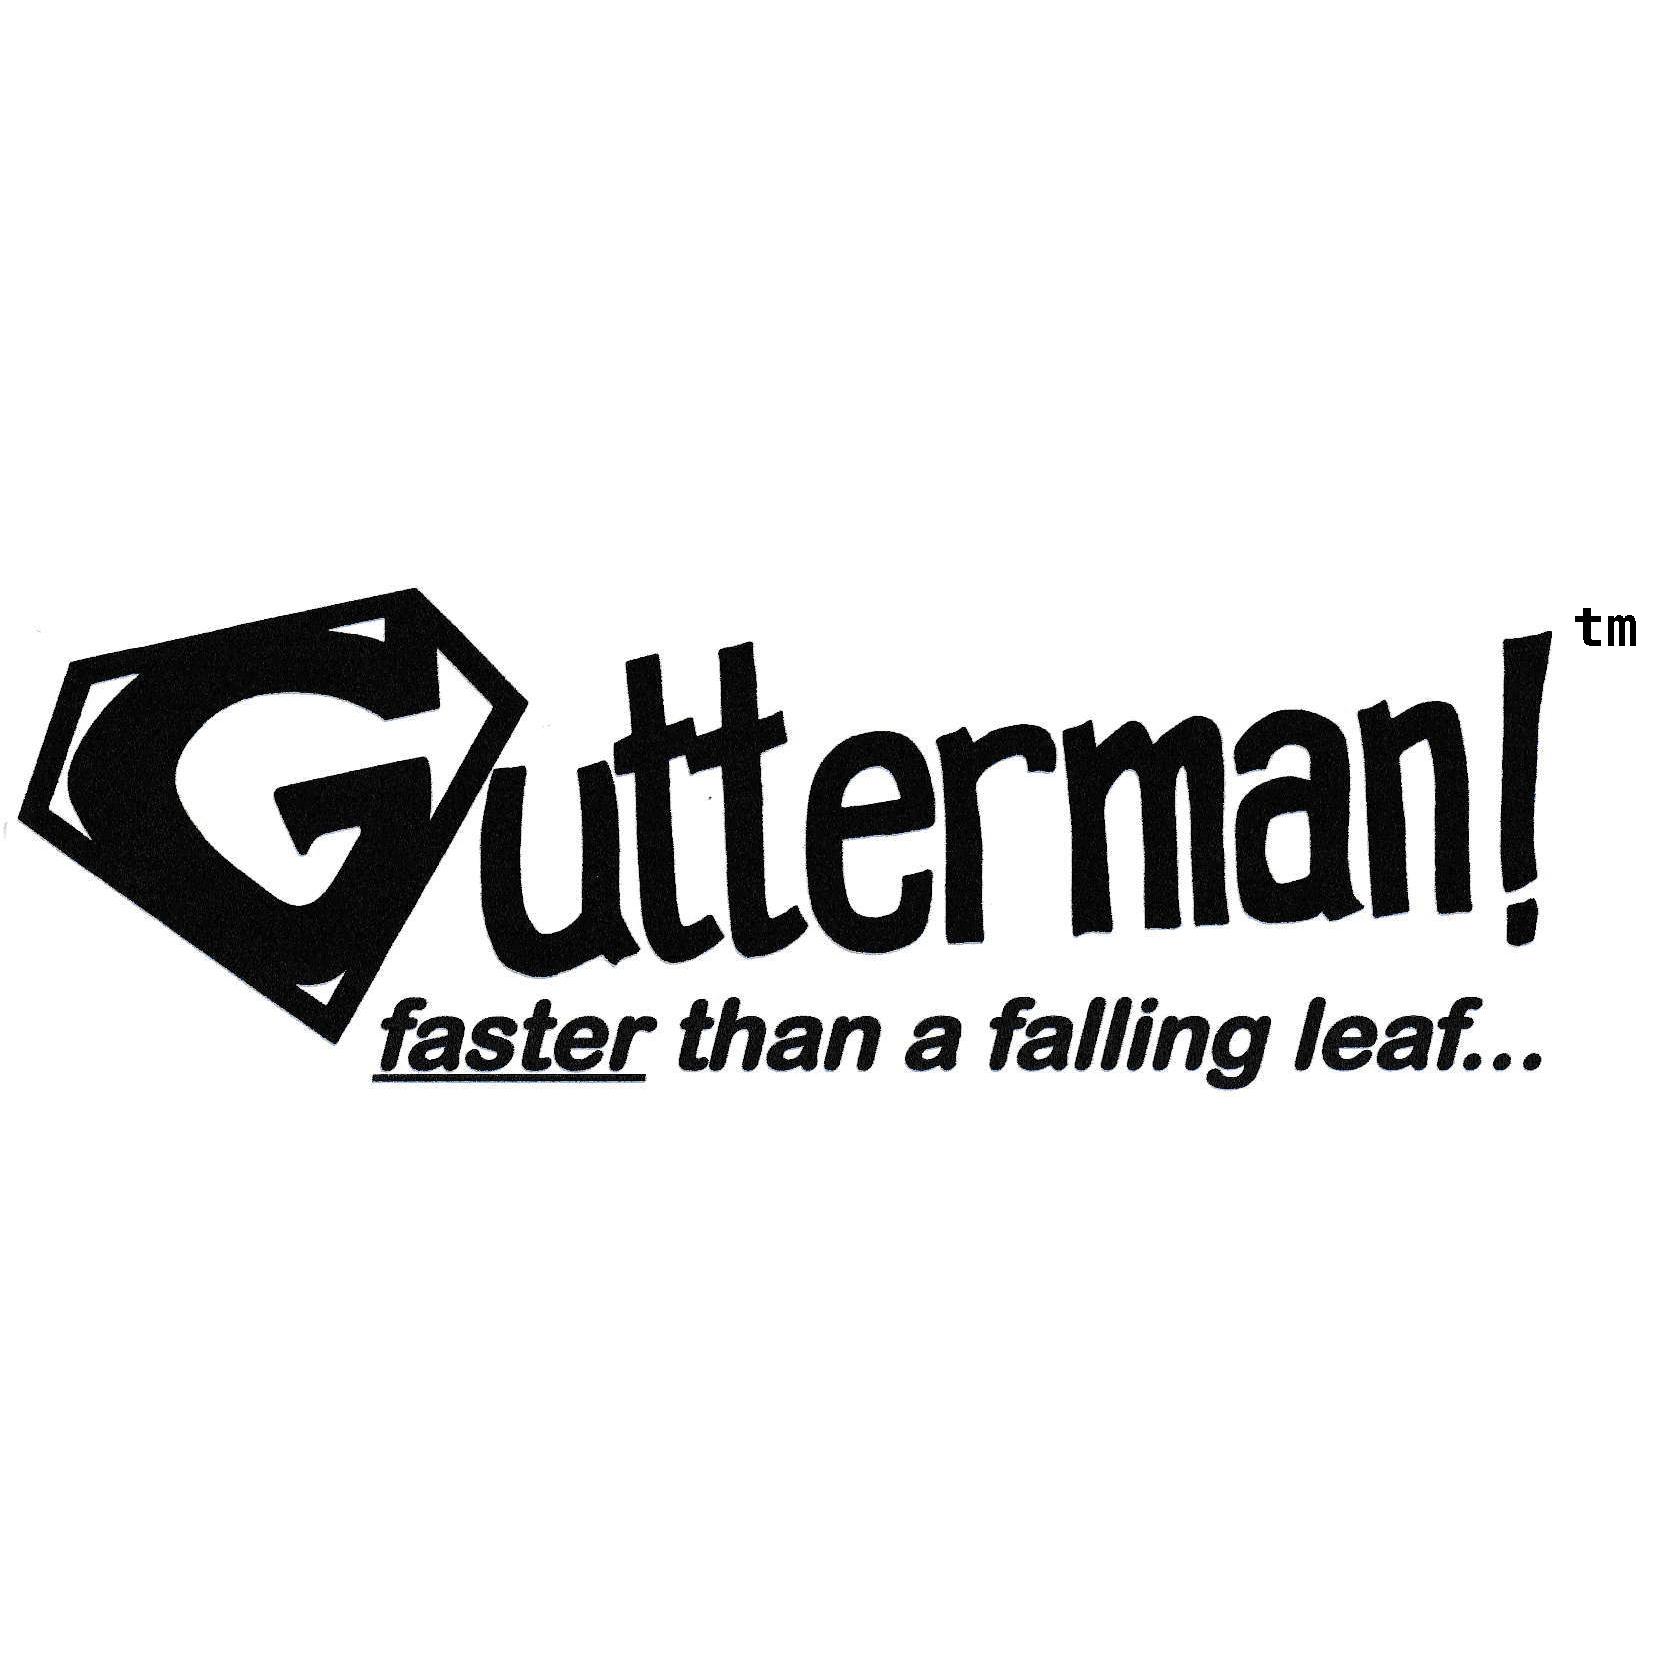 Gutterman - Princeton, NJ 08540 - (609)921-2299 | ShowMeLocal.com